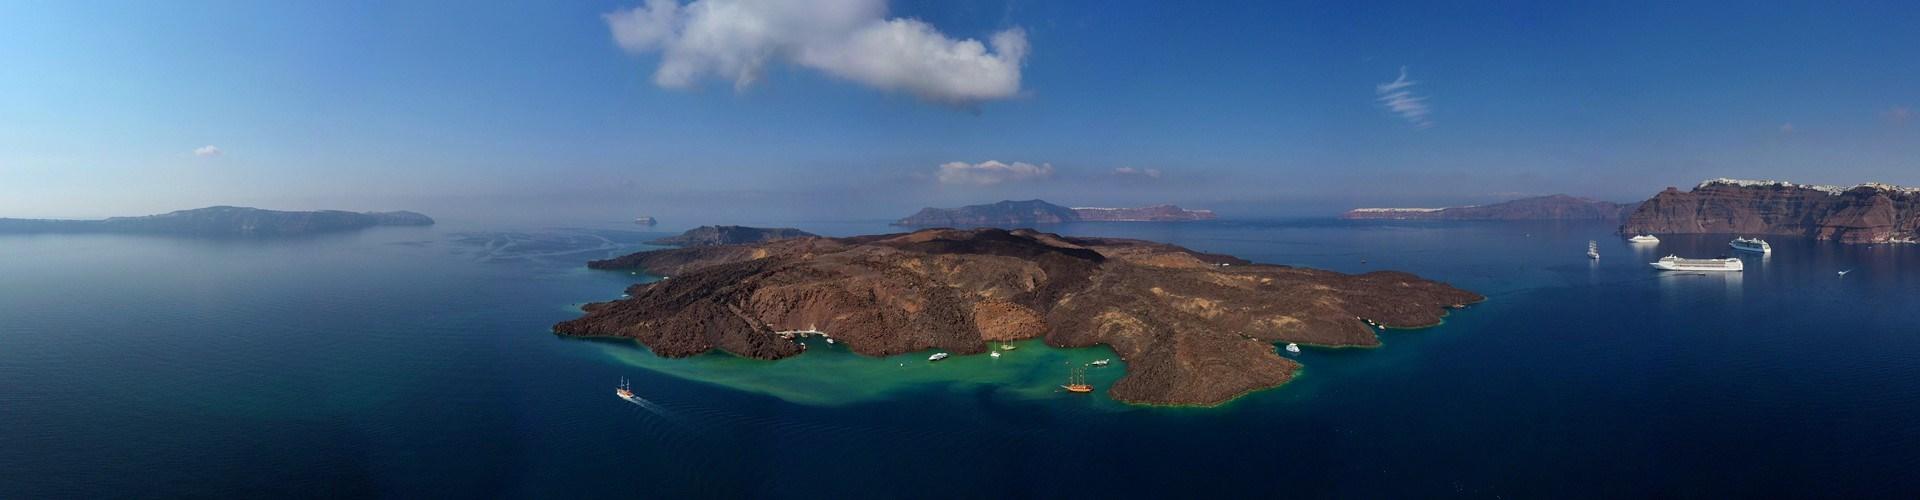 Santorini Volcano & Hot Springs - Attractions - Santorini